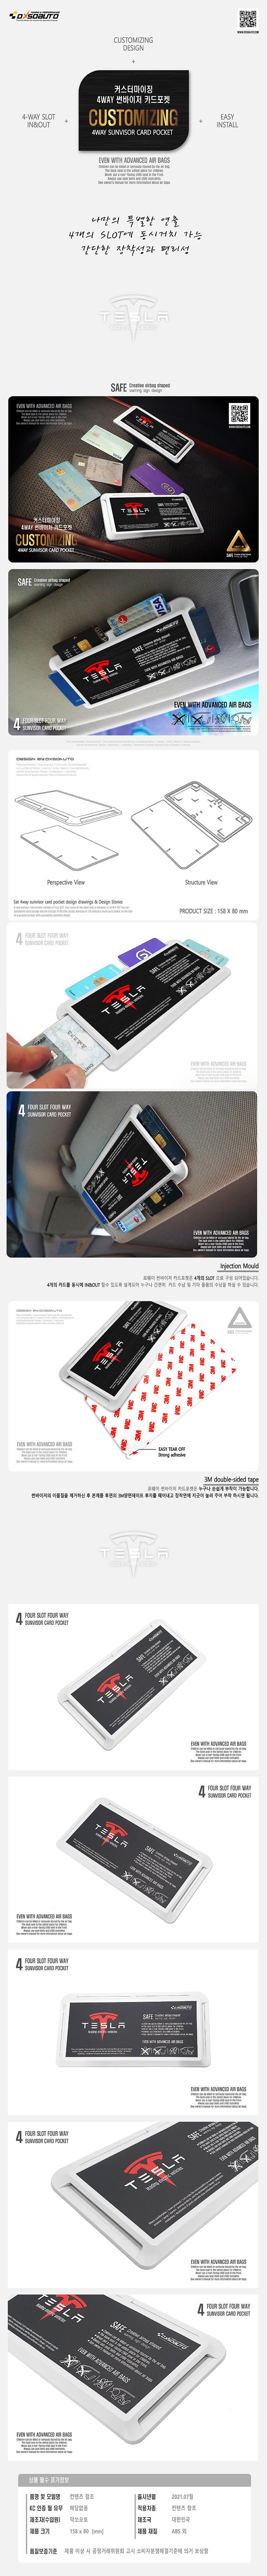 [DXSOAUTO] 커스터마이징 4WAY 썬바이저 카드포켓 (1EA / 1SET) 테슬라 화이트